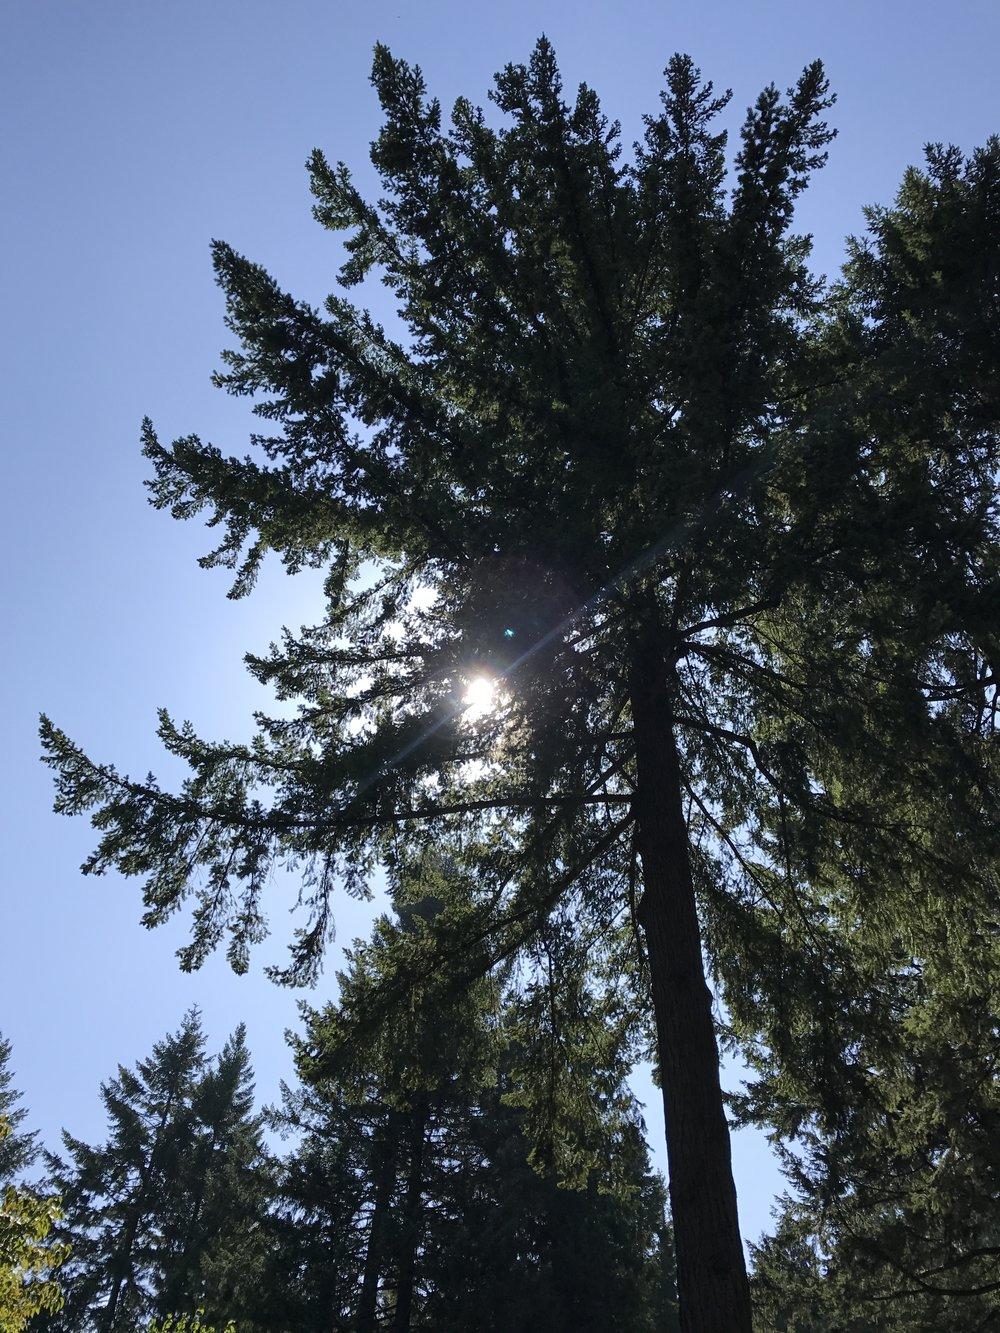 Sun peeking through the trees